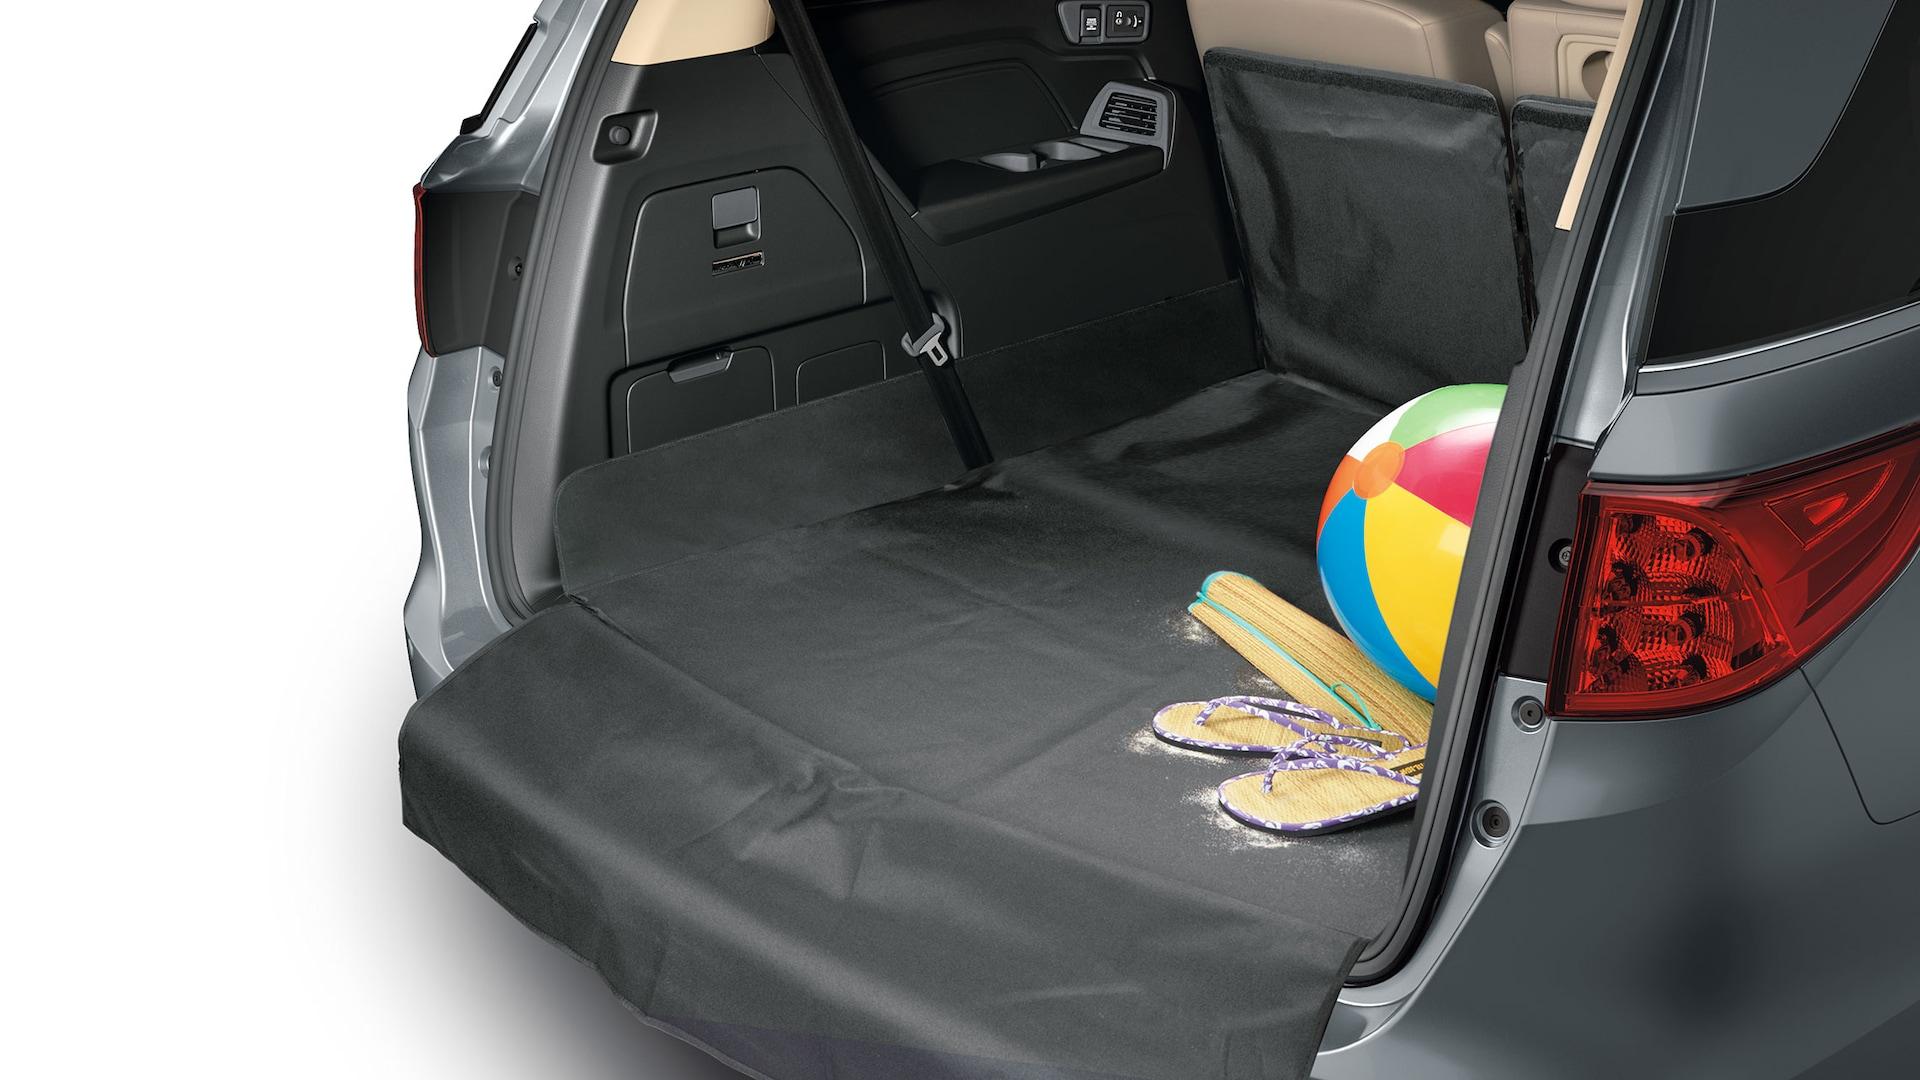 Detalle del accesorio de tapete para carga plegable de la Honda Odyssey2020.